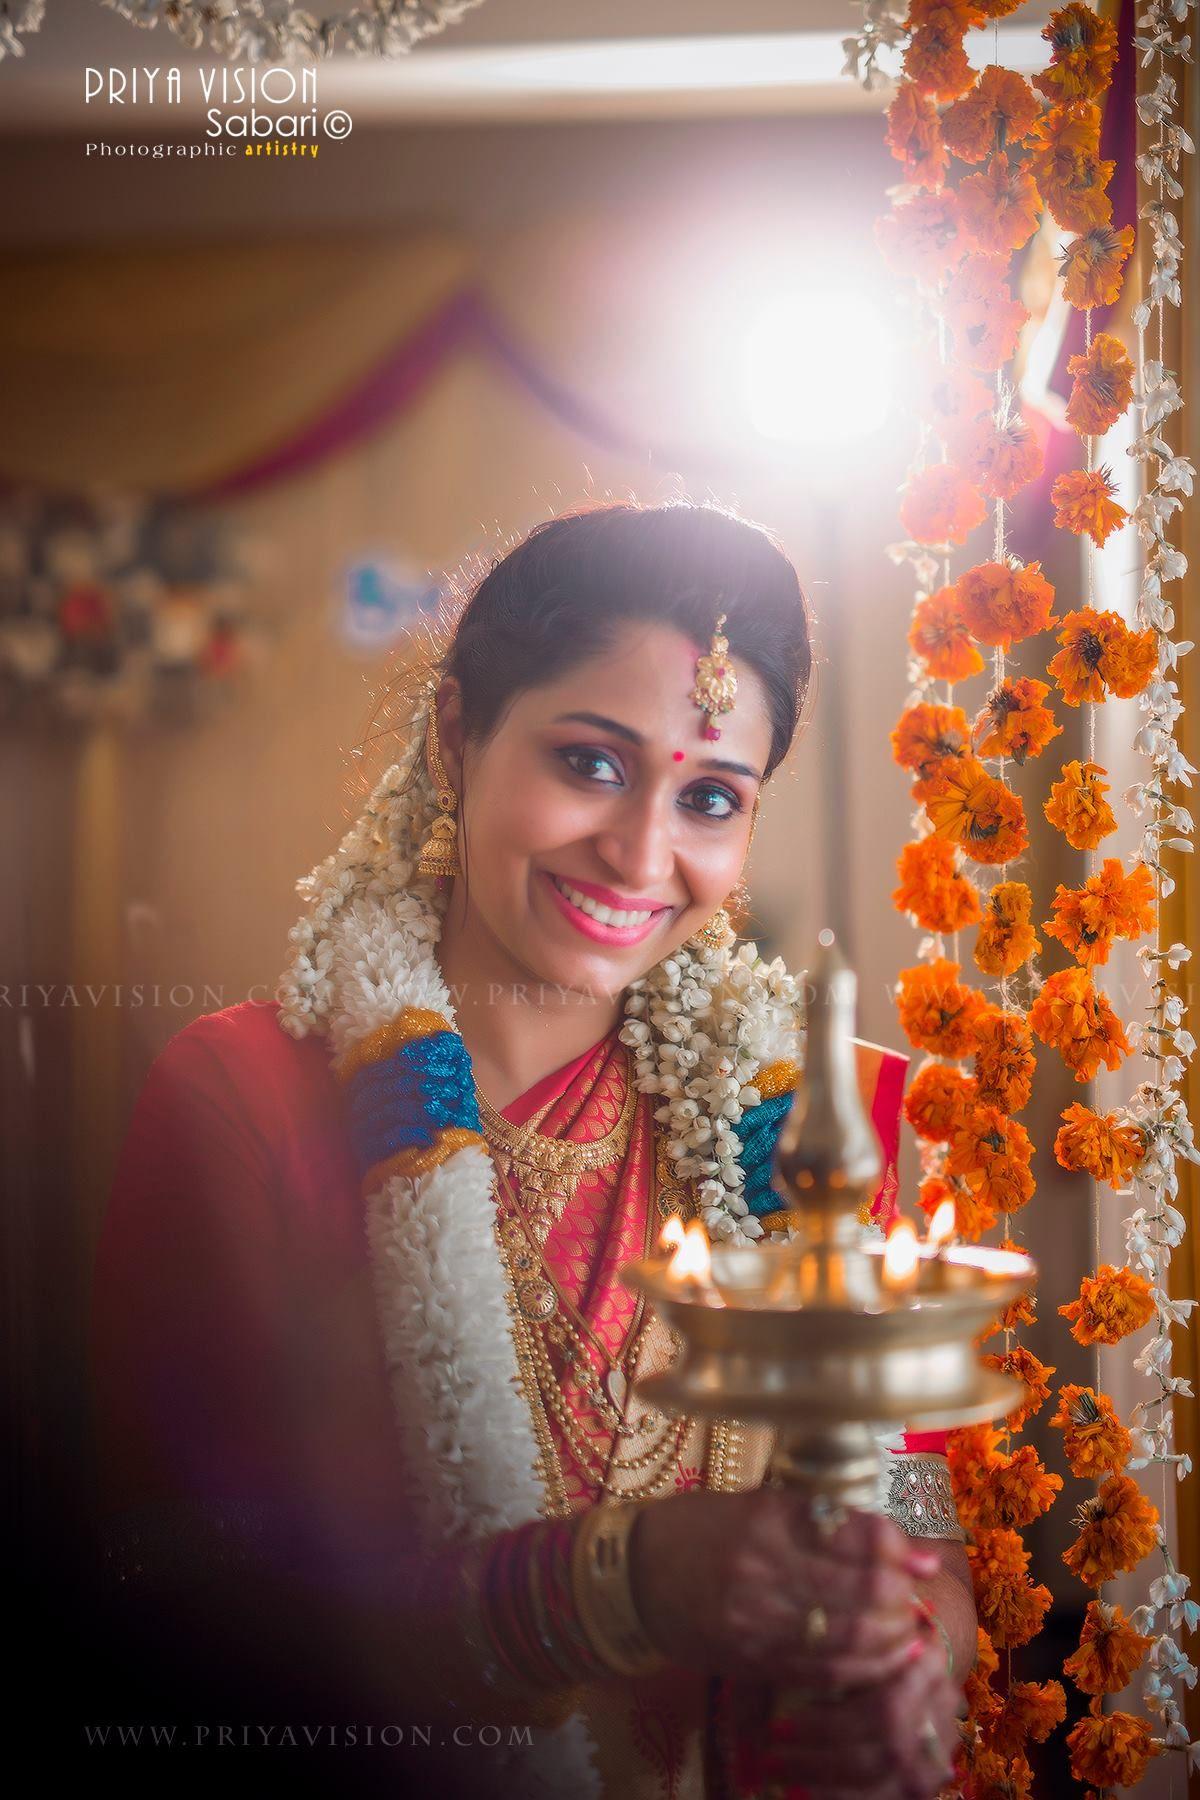 Gorgeous South Indian Brides Pics Captured By Priya Vision Sabari Photography Please Visit Our Website Wedding FramesWedding AlbumsWedding